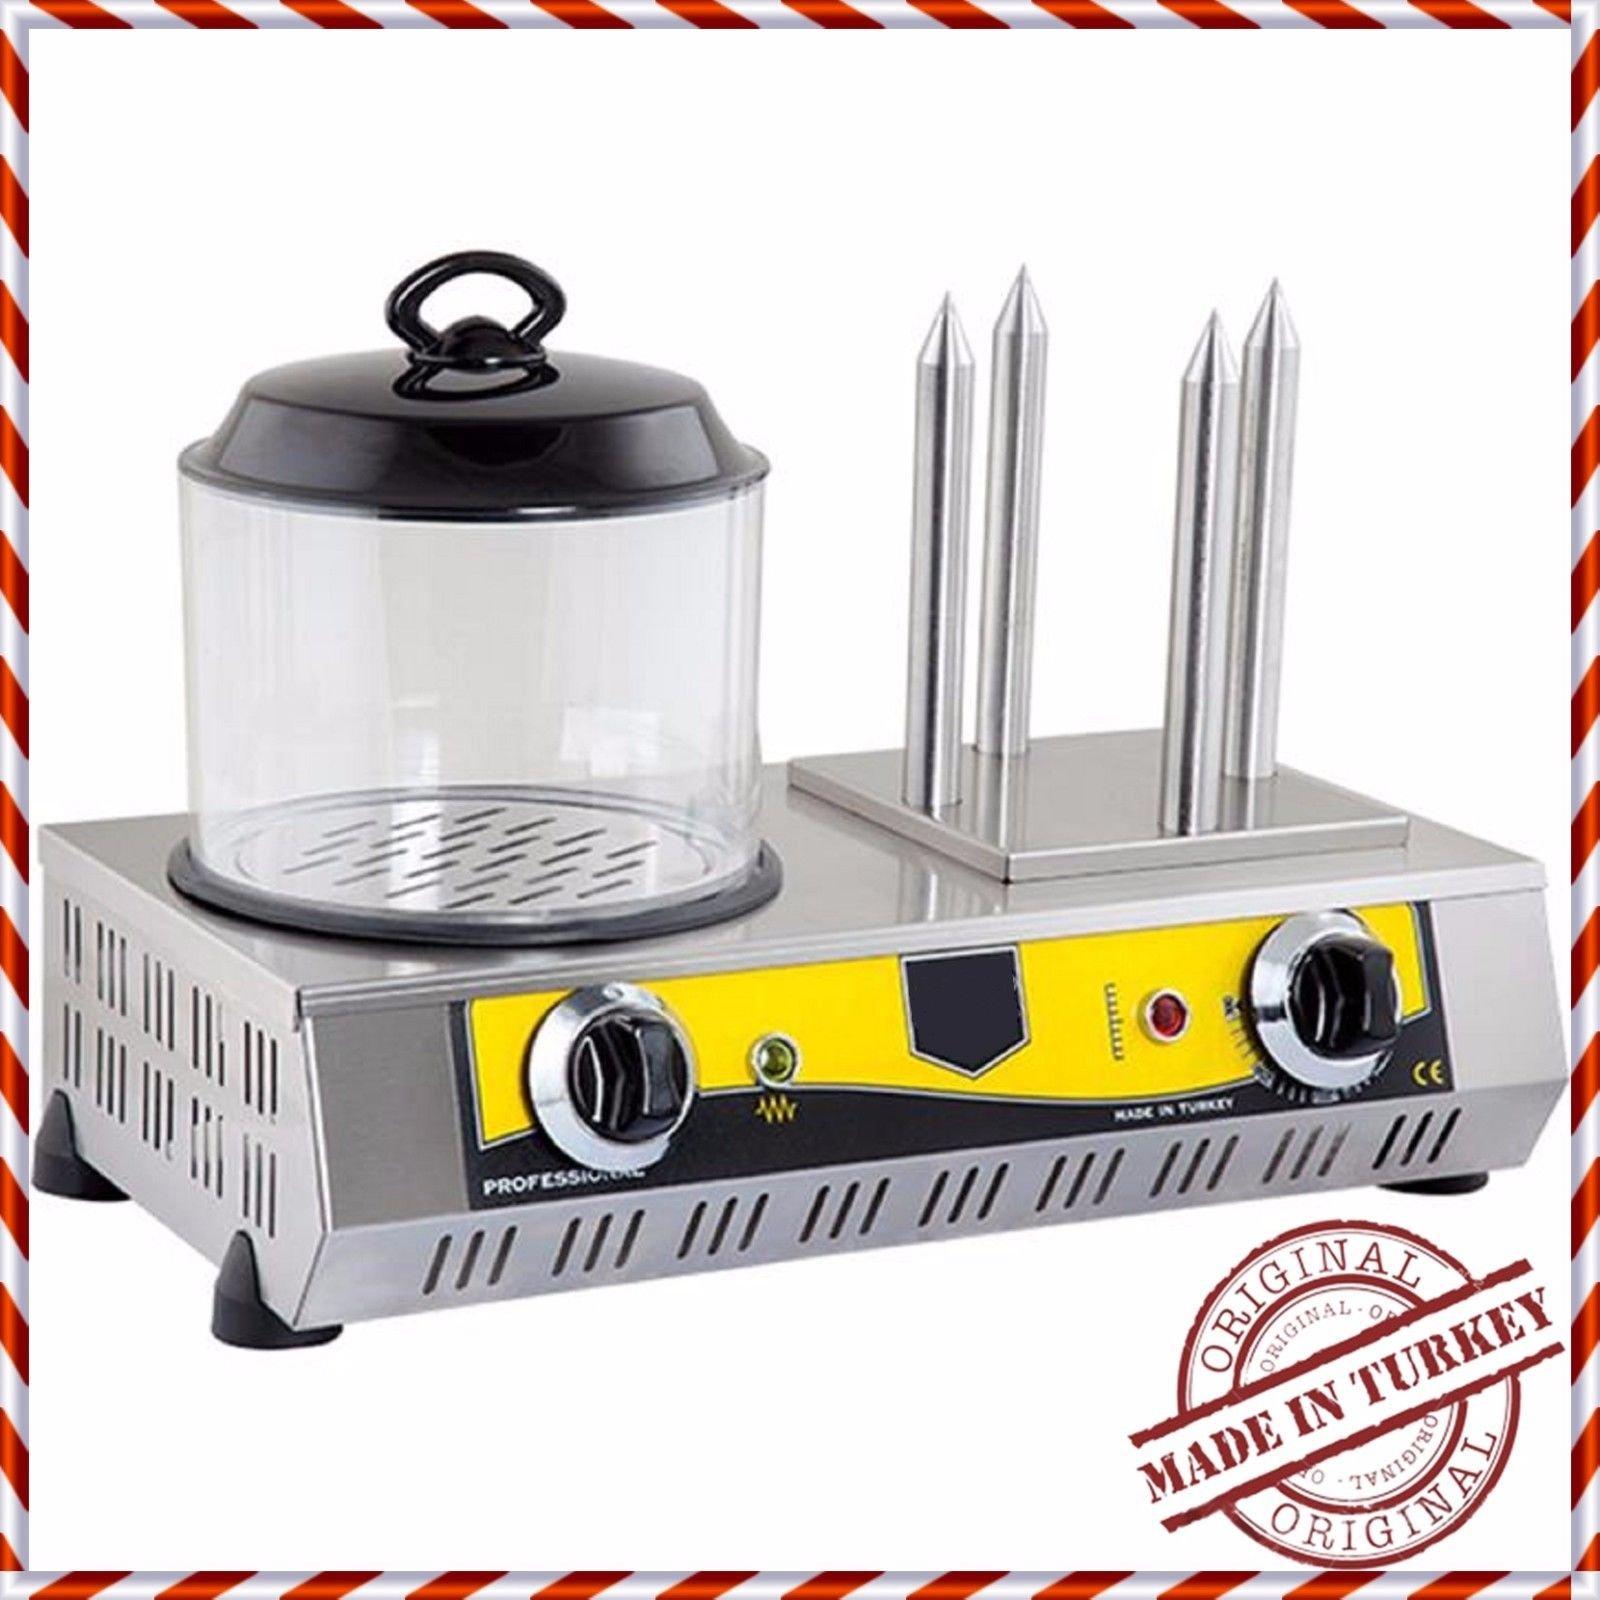 Commercial Kitchen Equipment PROFESSIONAL European-Style Hot Dog Steamer Cooker Hotdog Machine and 4 Bun Roller Warmer